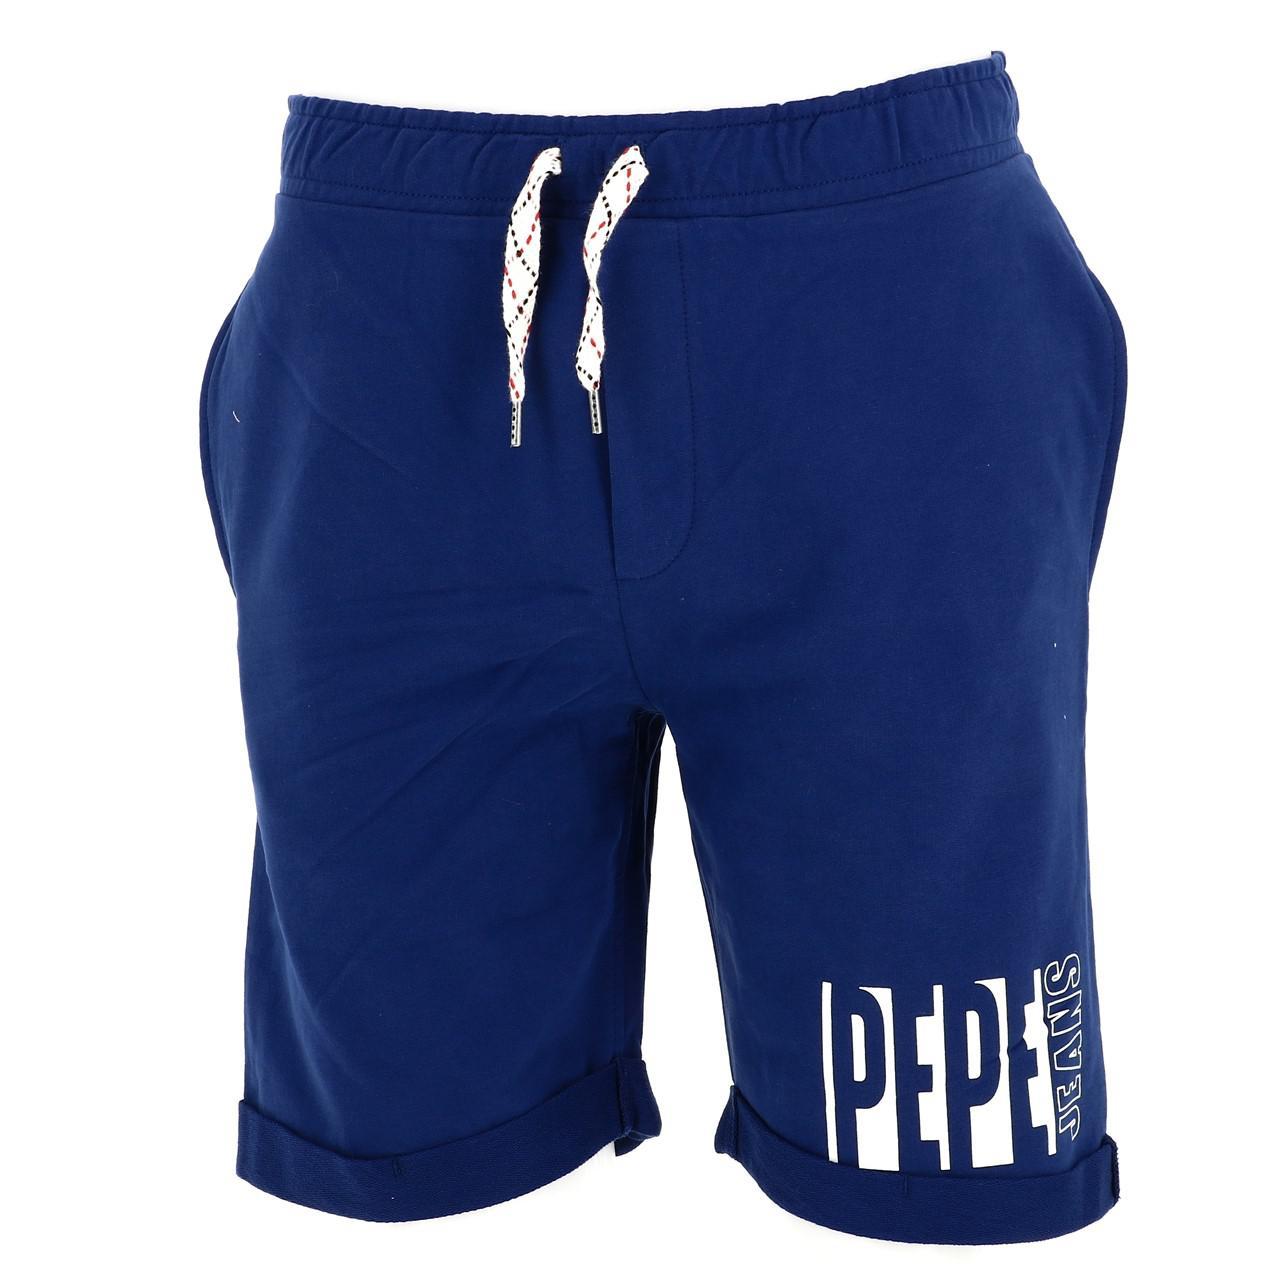 Bermuda-Shorts-Pepe-jeans-Otto-Navy-Shorts-Jr-Blue-17691-New